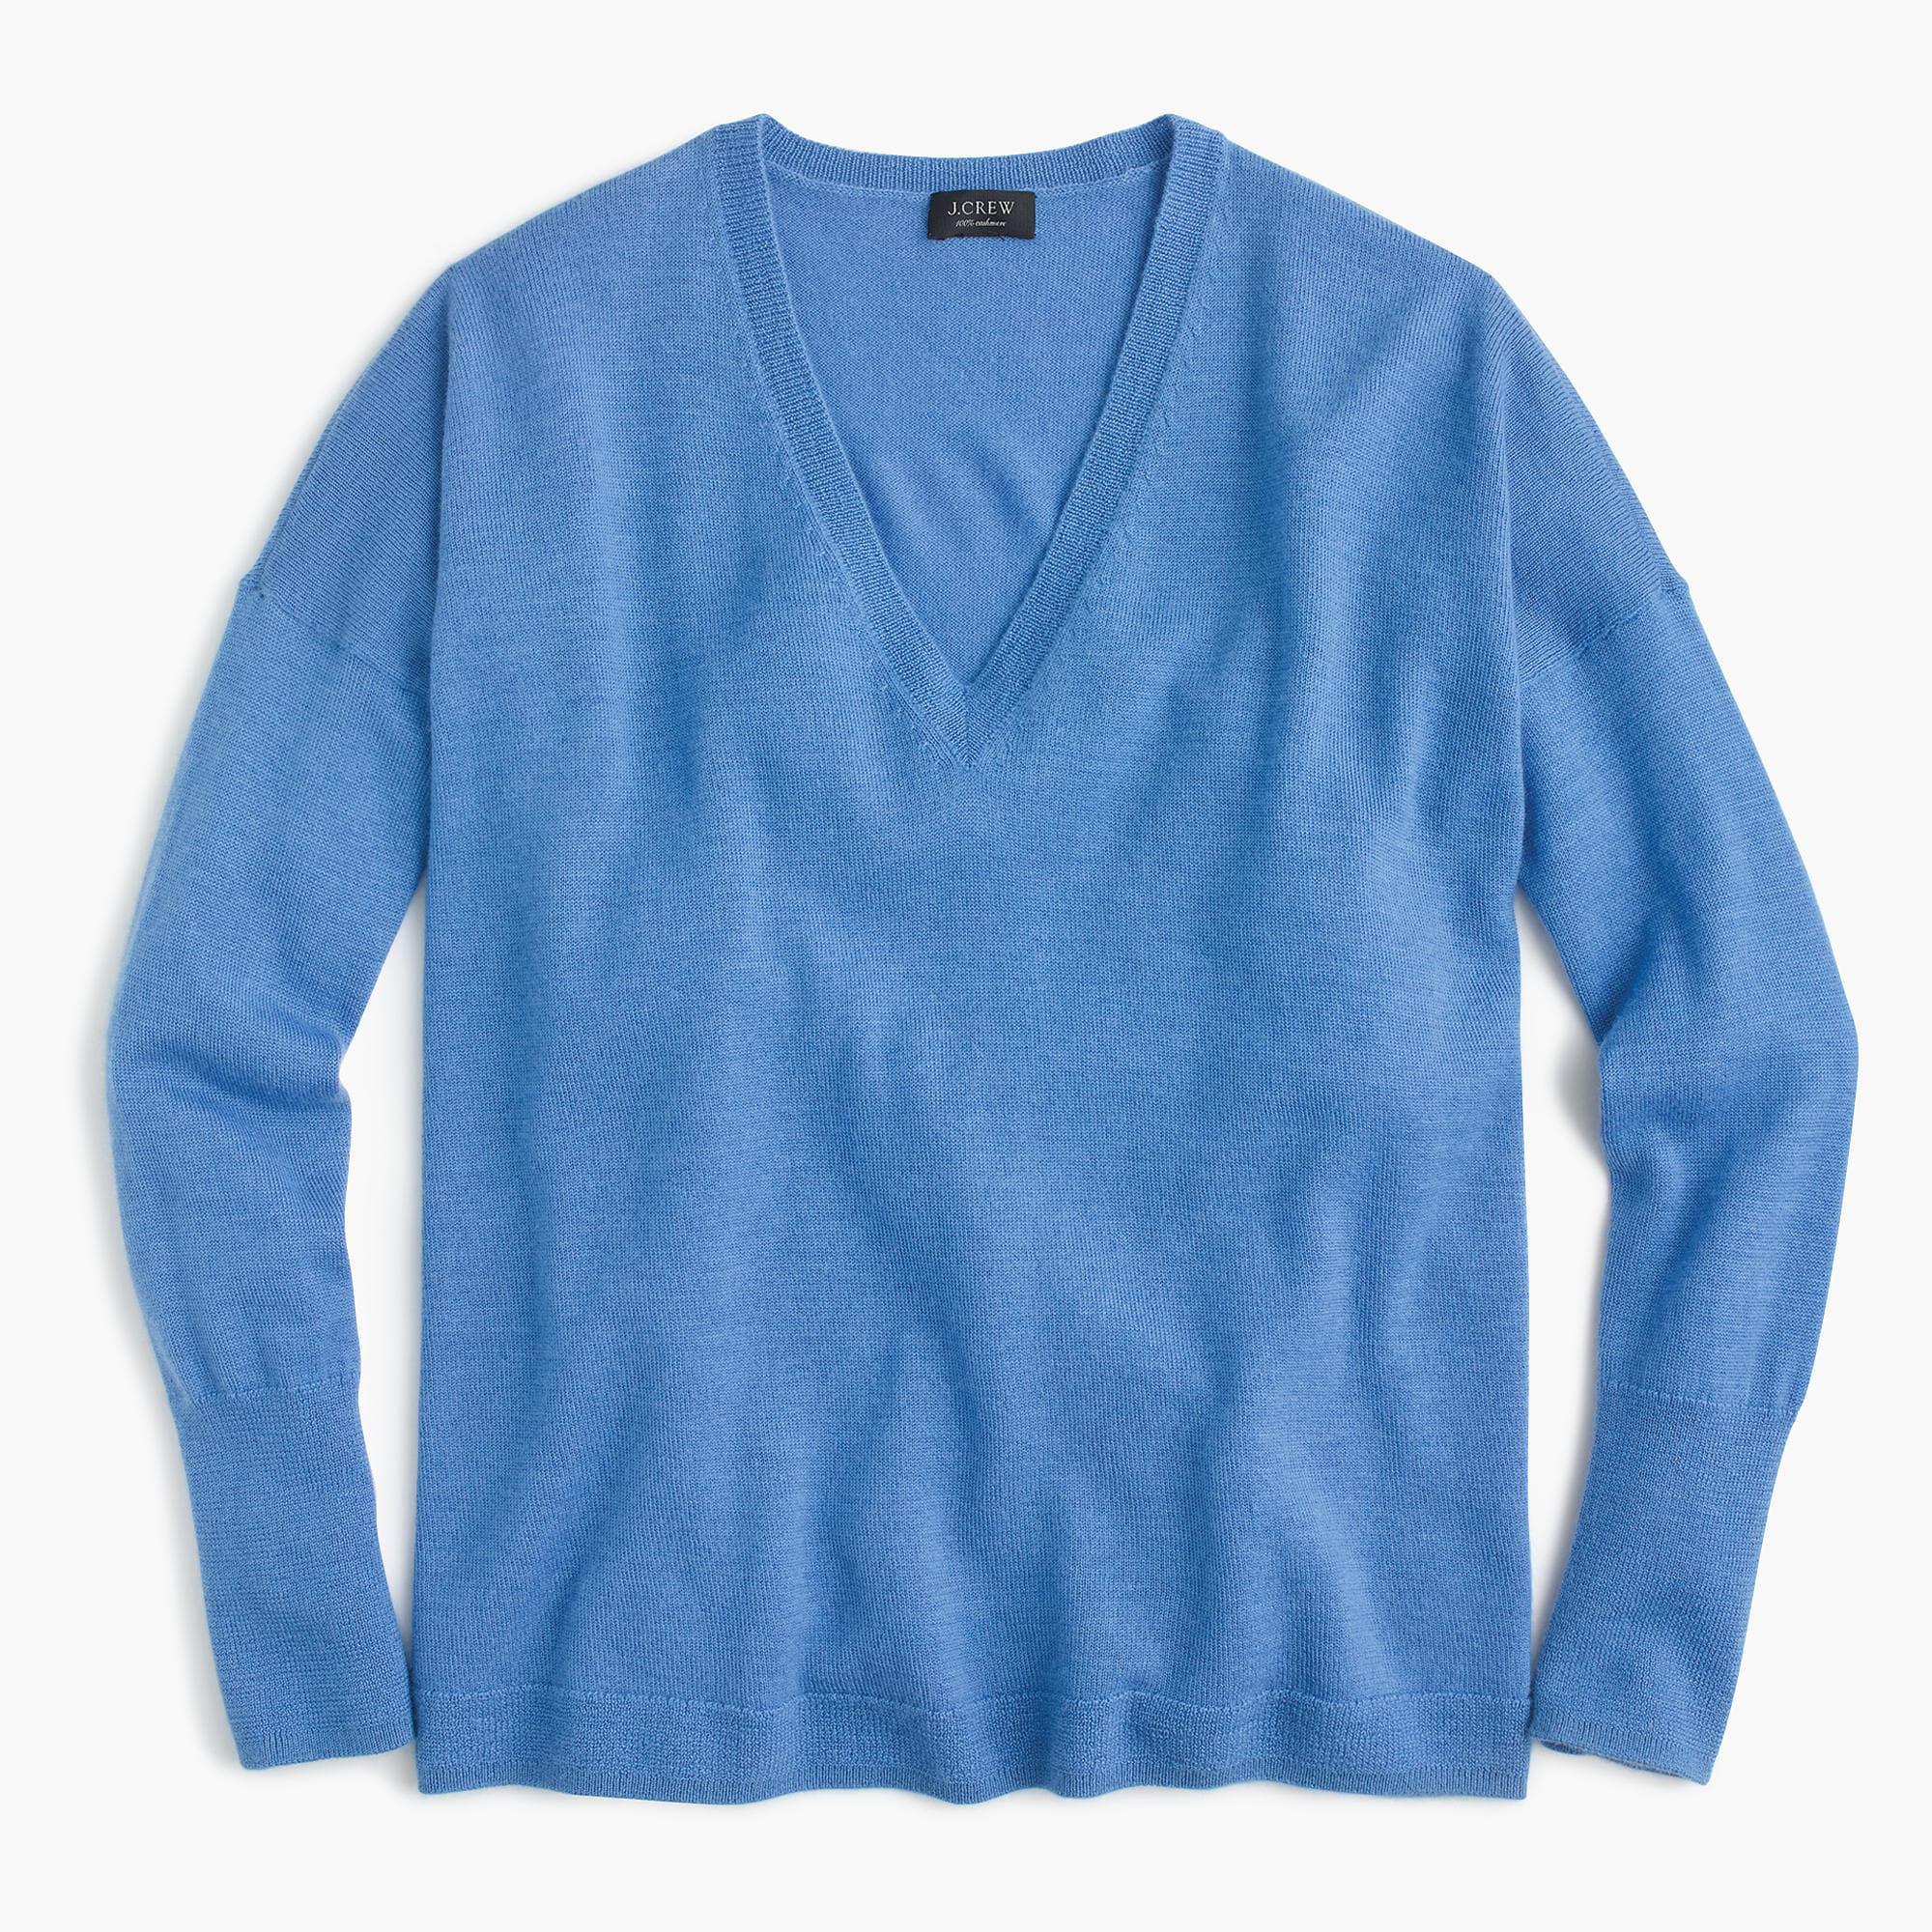 35e0bf534669 Lyst - J.Crew V-neck Boyfriend Sweater In Everyday Cashmere in Blue